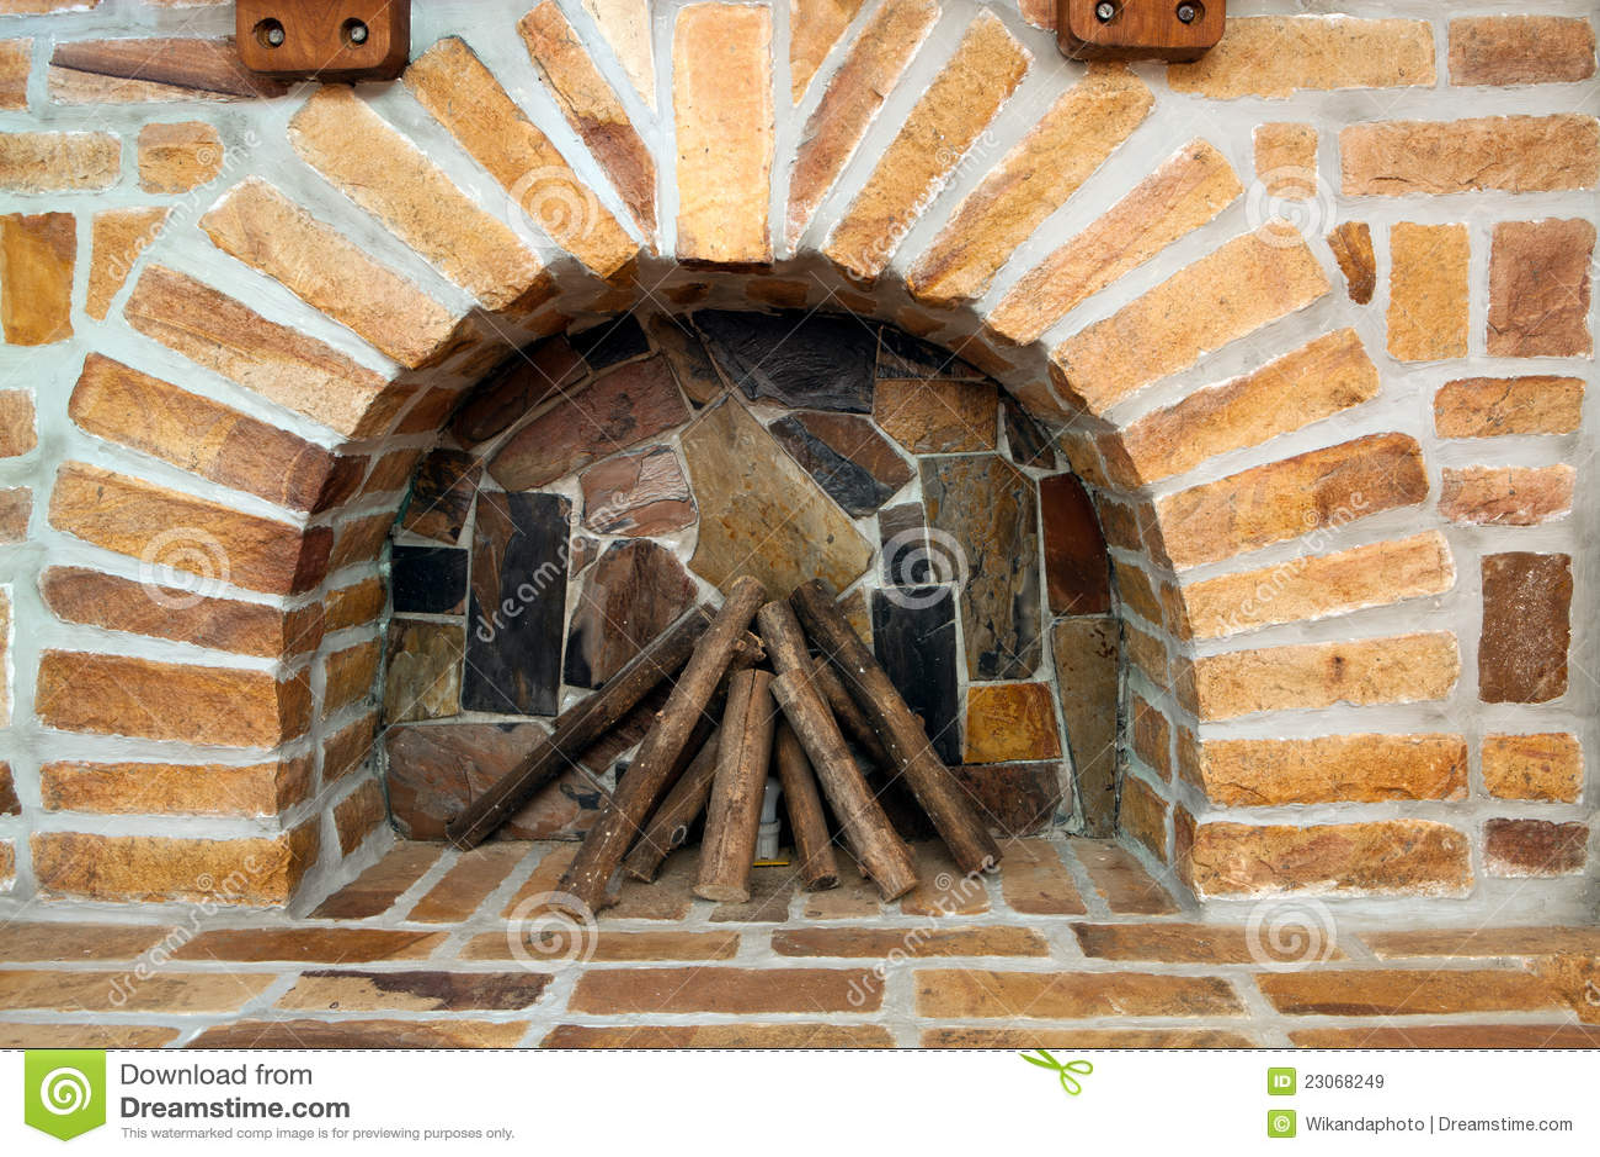 Nueva chimenea del ladrillo imagen de archivo imagen - Chimenea ladrillo ...